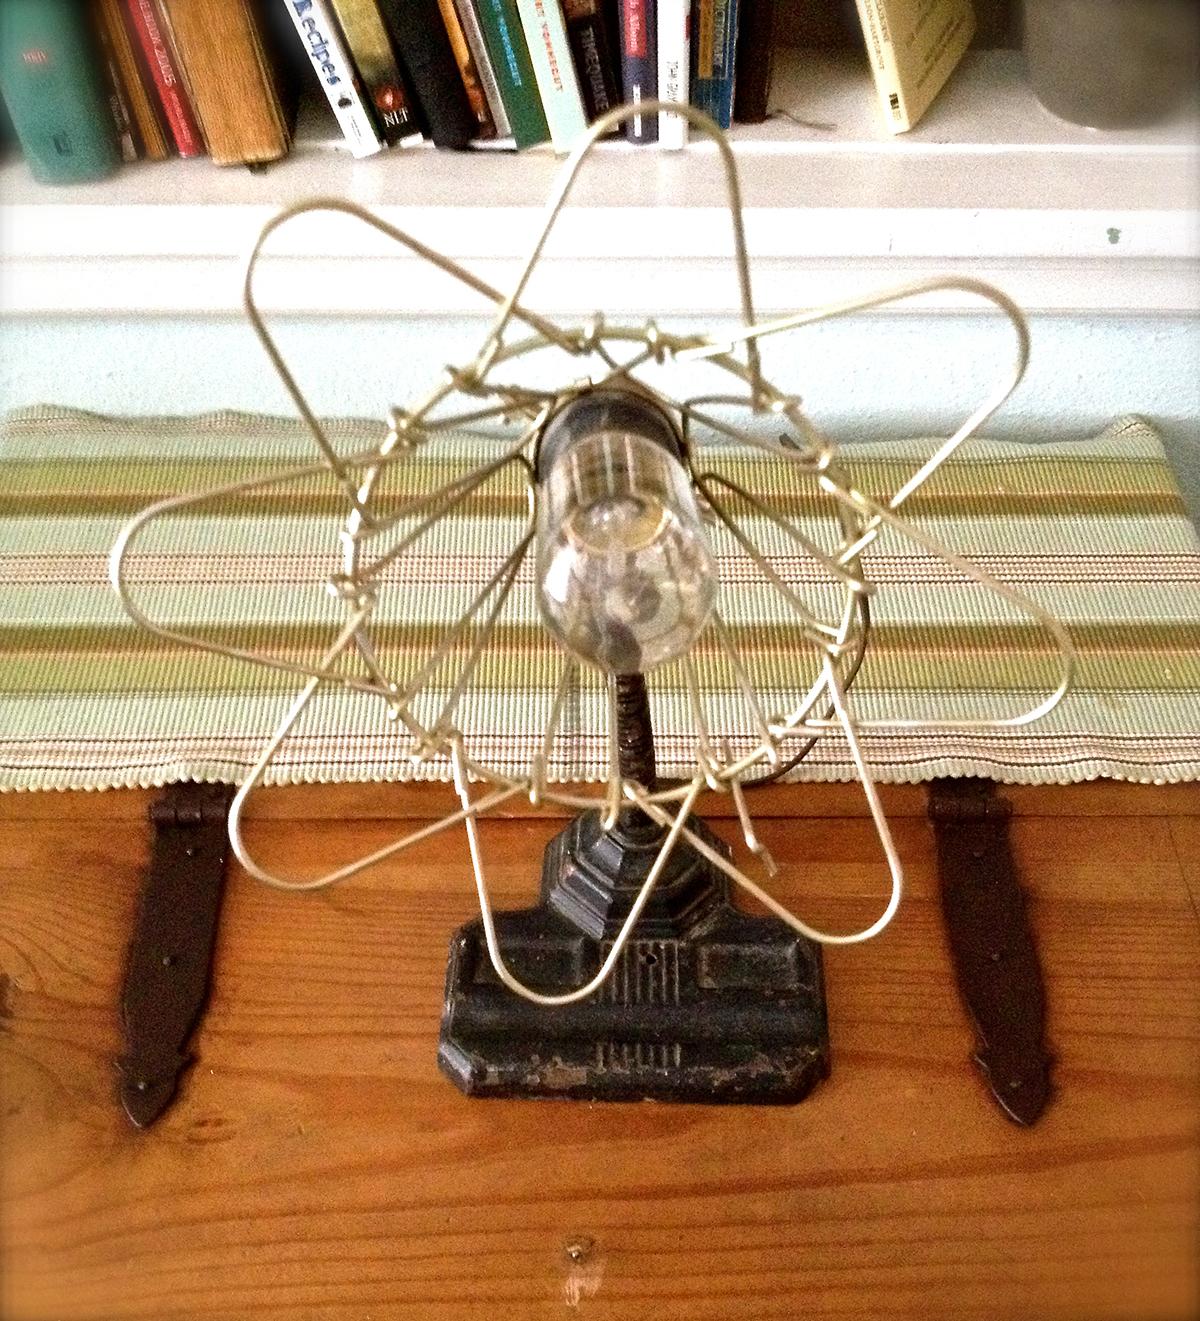 Vintage 40s cast iron metal deco industrial gooseneck desk lamp light - Image Image Image Vintage Gooseneck Desk Lamp With A Cast Iron